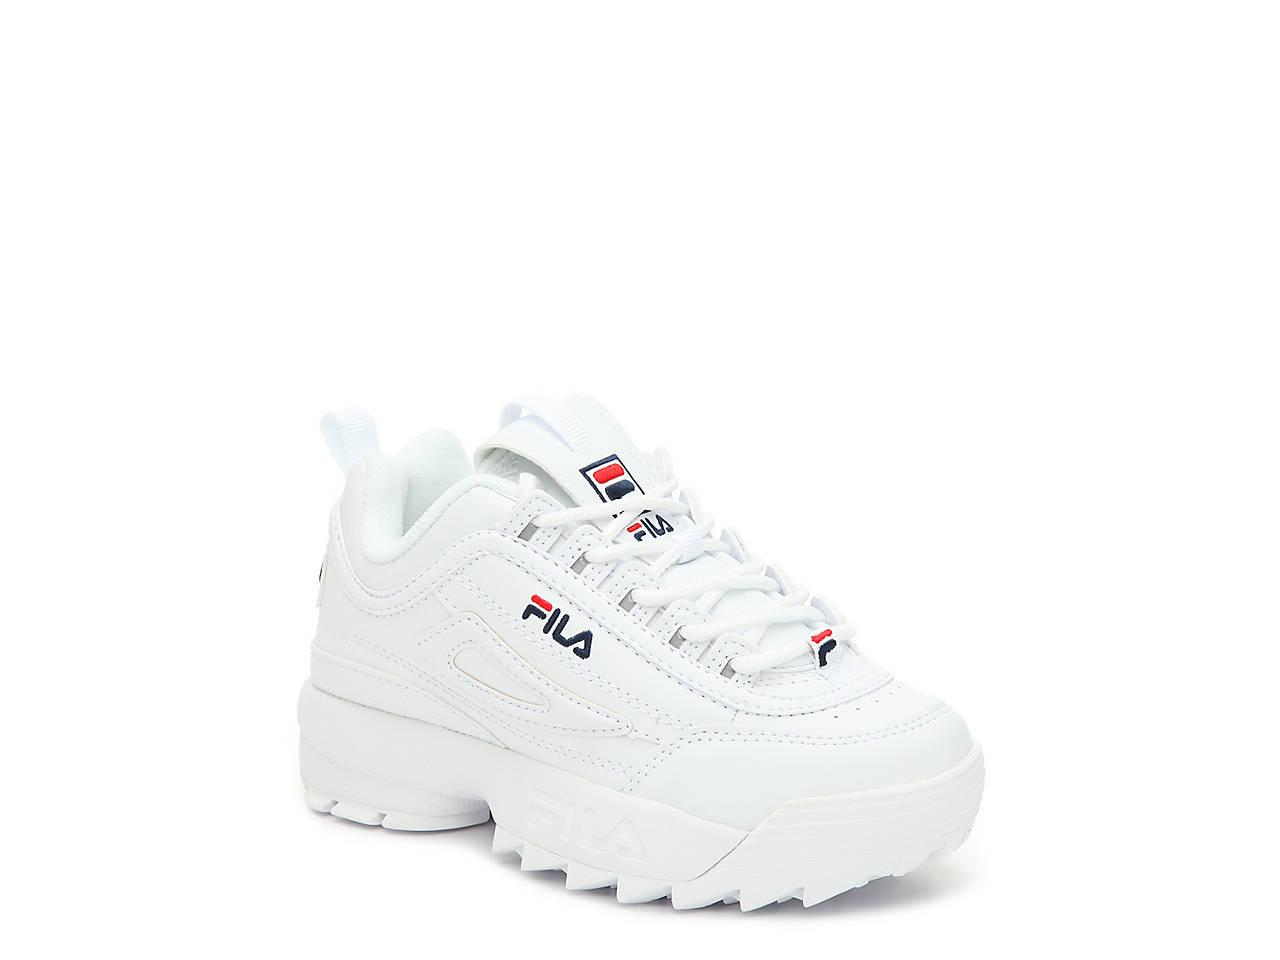 c06f9ee2d9e5 Fila Disruptor II Toddler   Youth Sneaker Kids Shoes